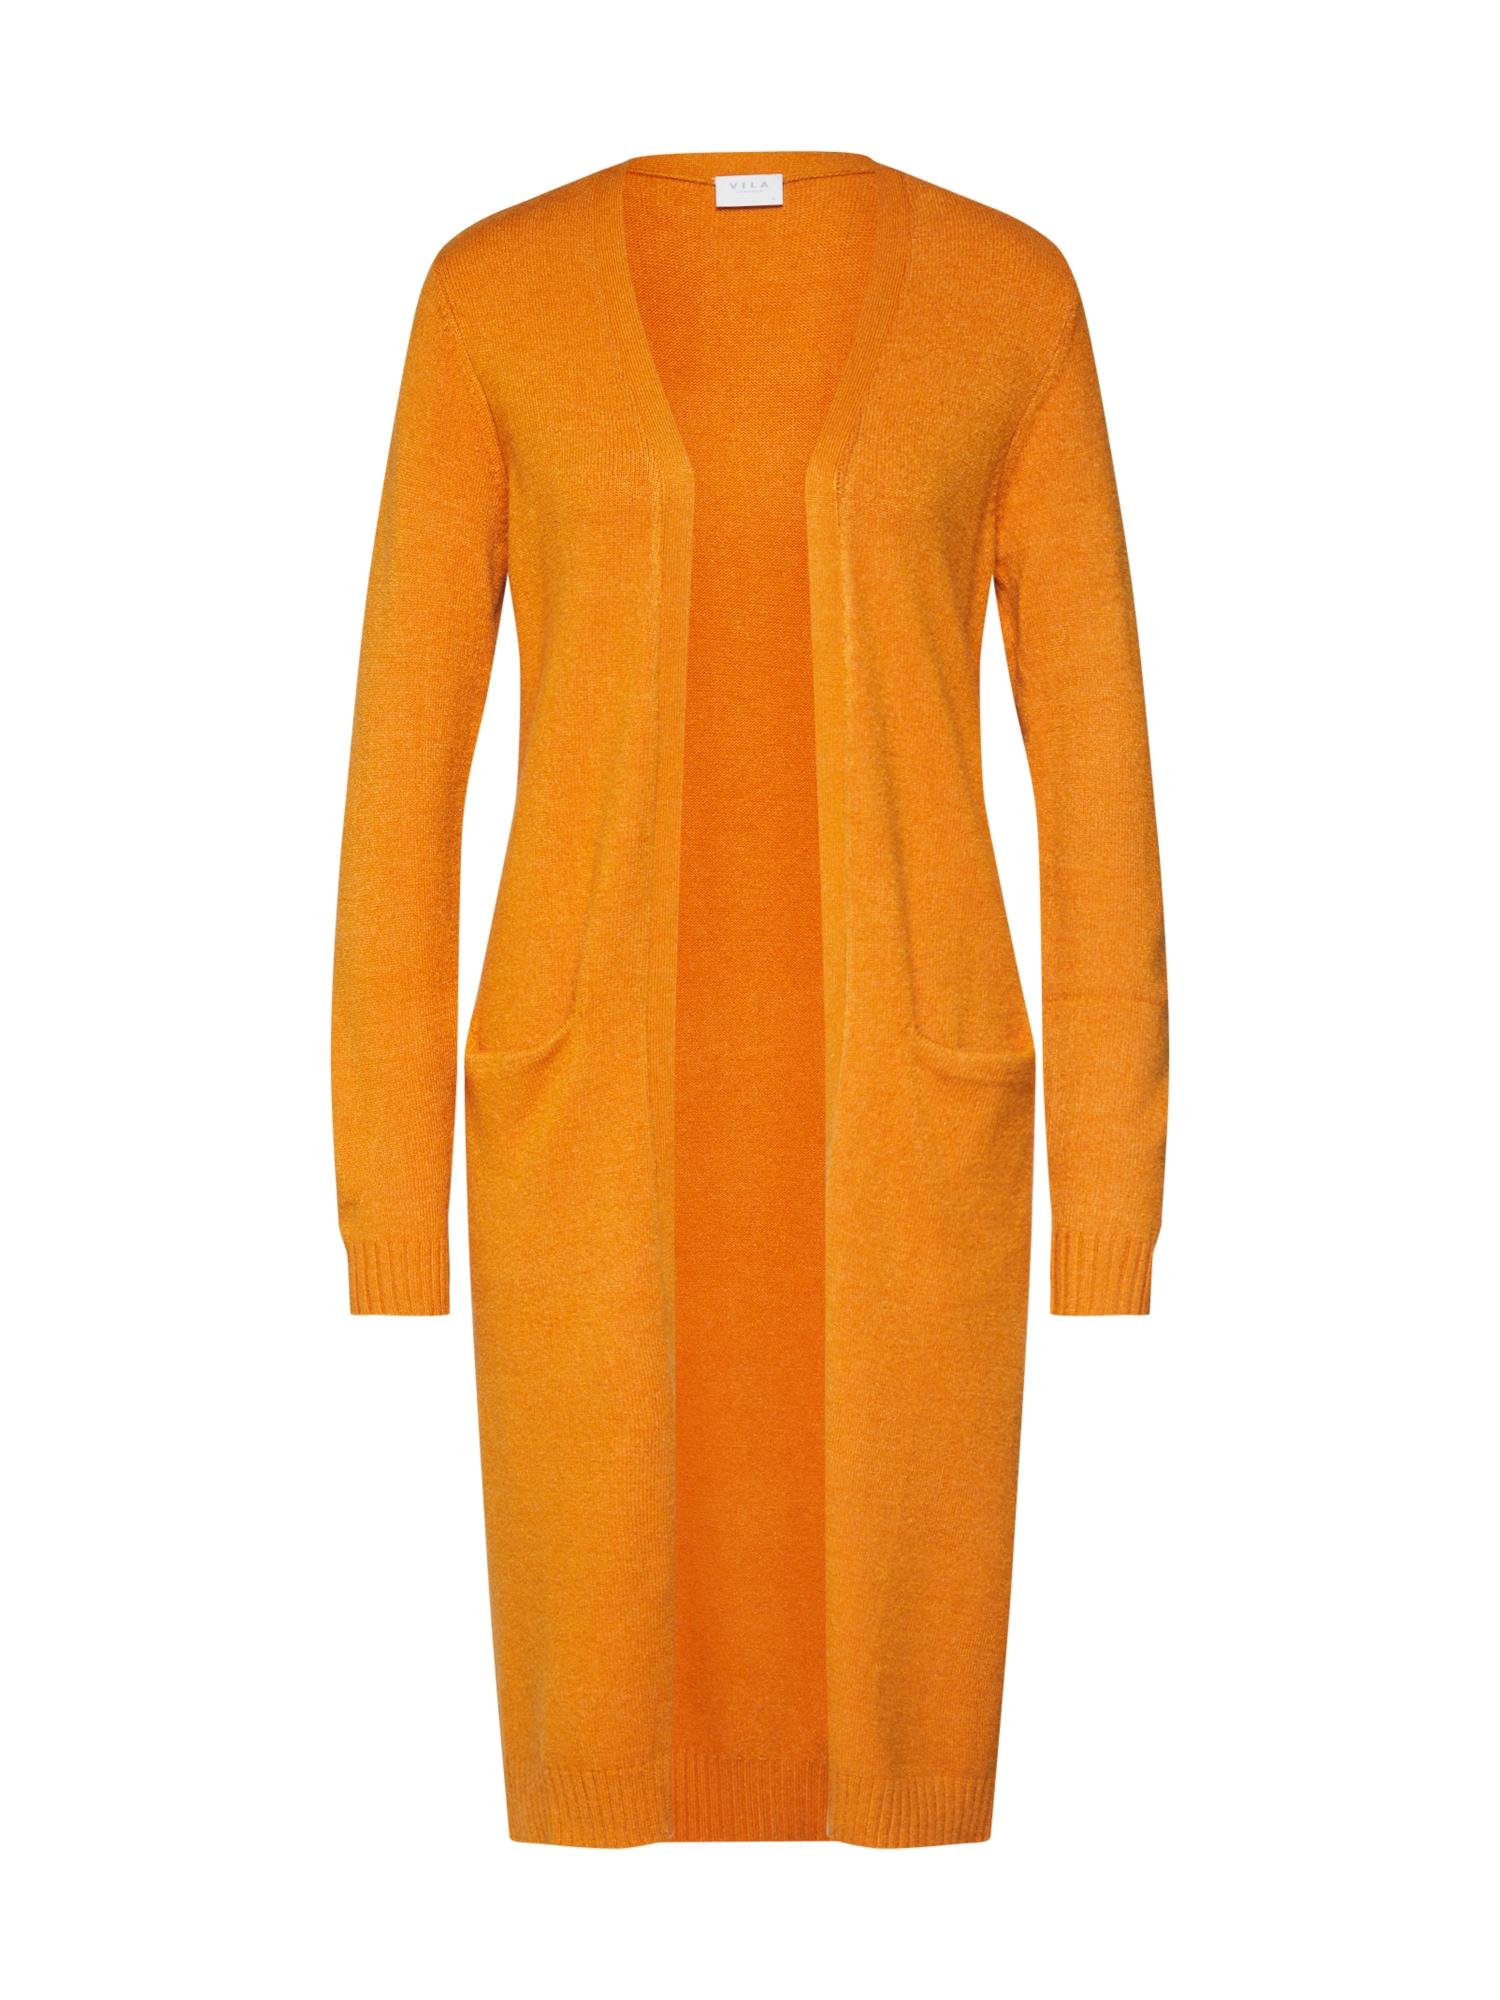 Pletený kabátek Ril oranžová VILA